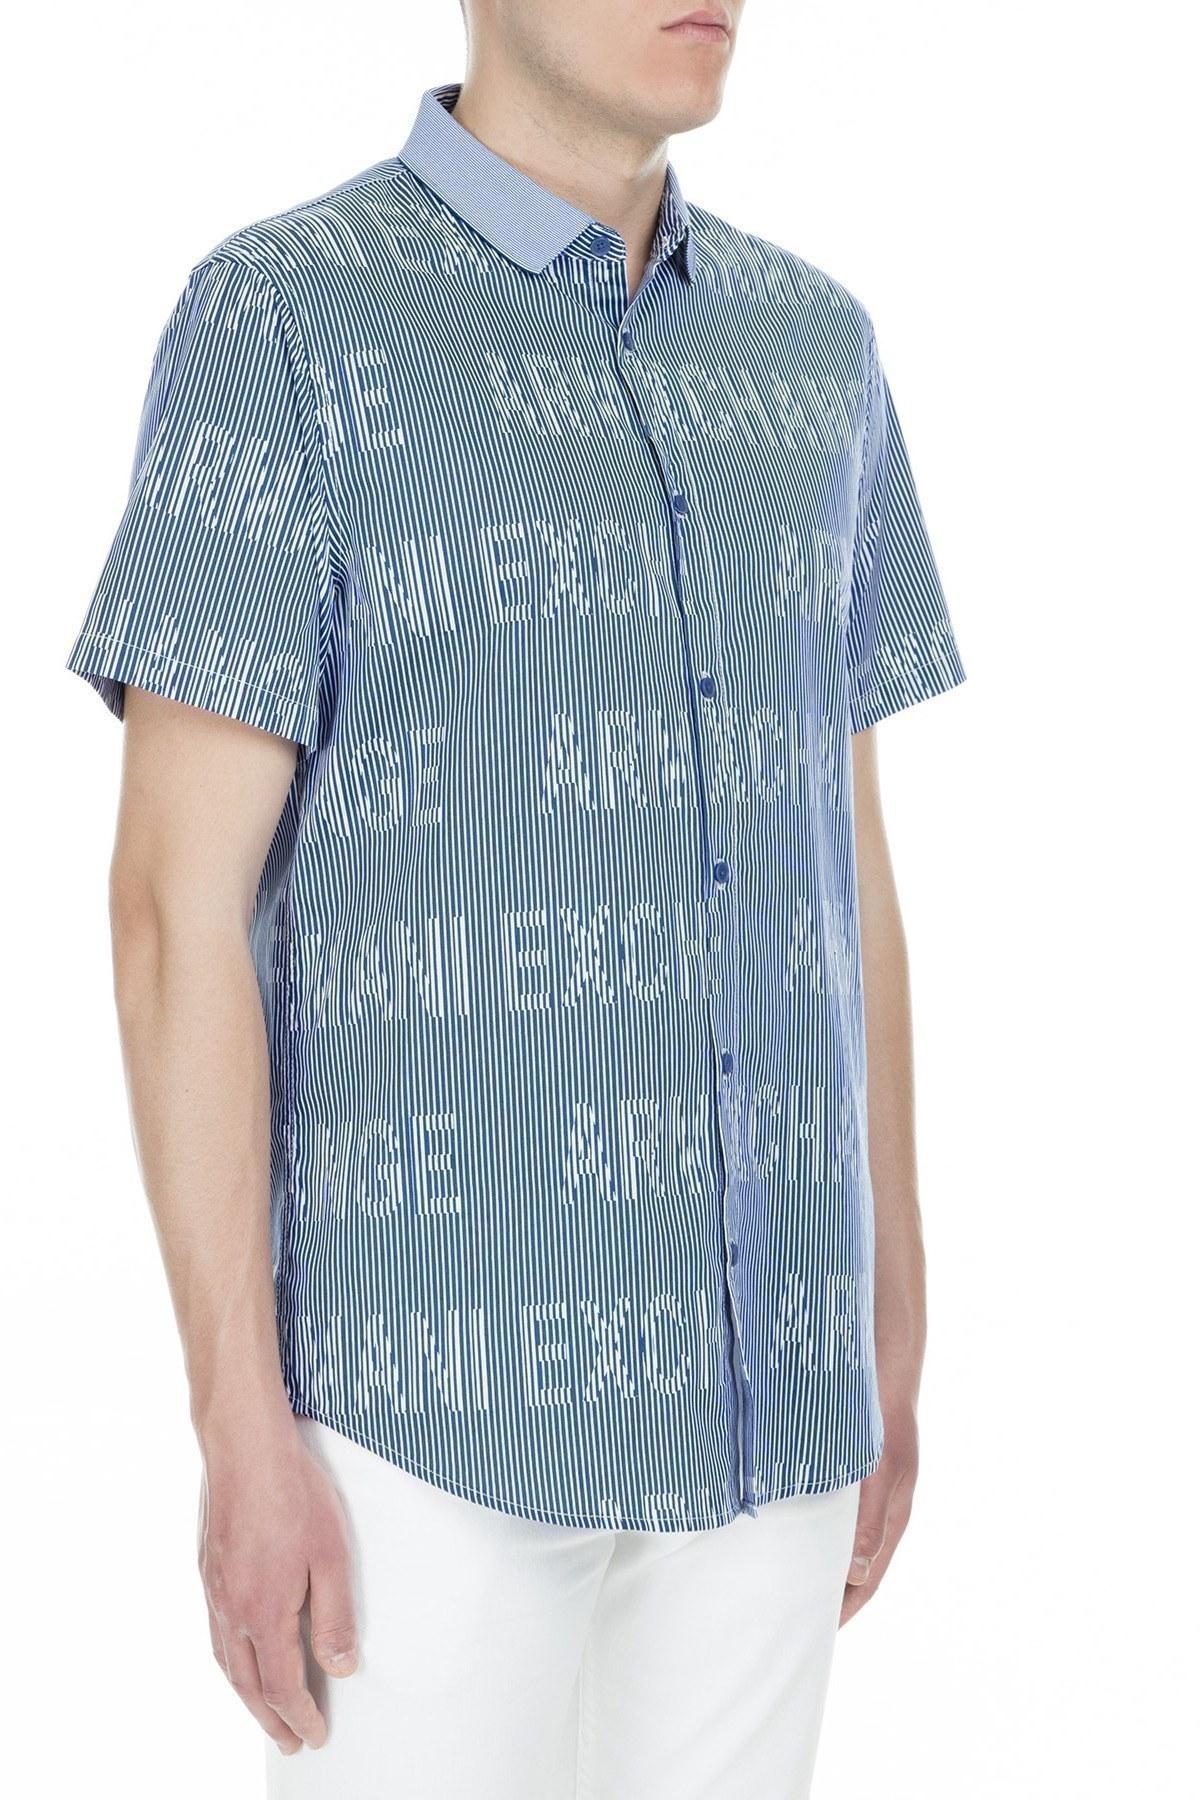 Armani Exchange Erkek Gömlek 3GZC35 ZNEAZ 6538 LACİVERT